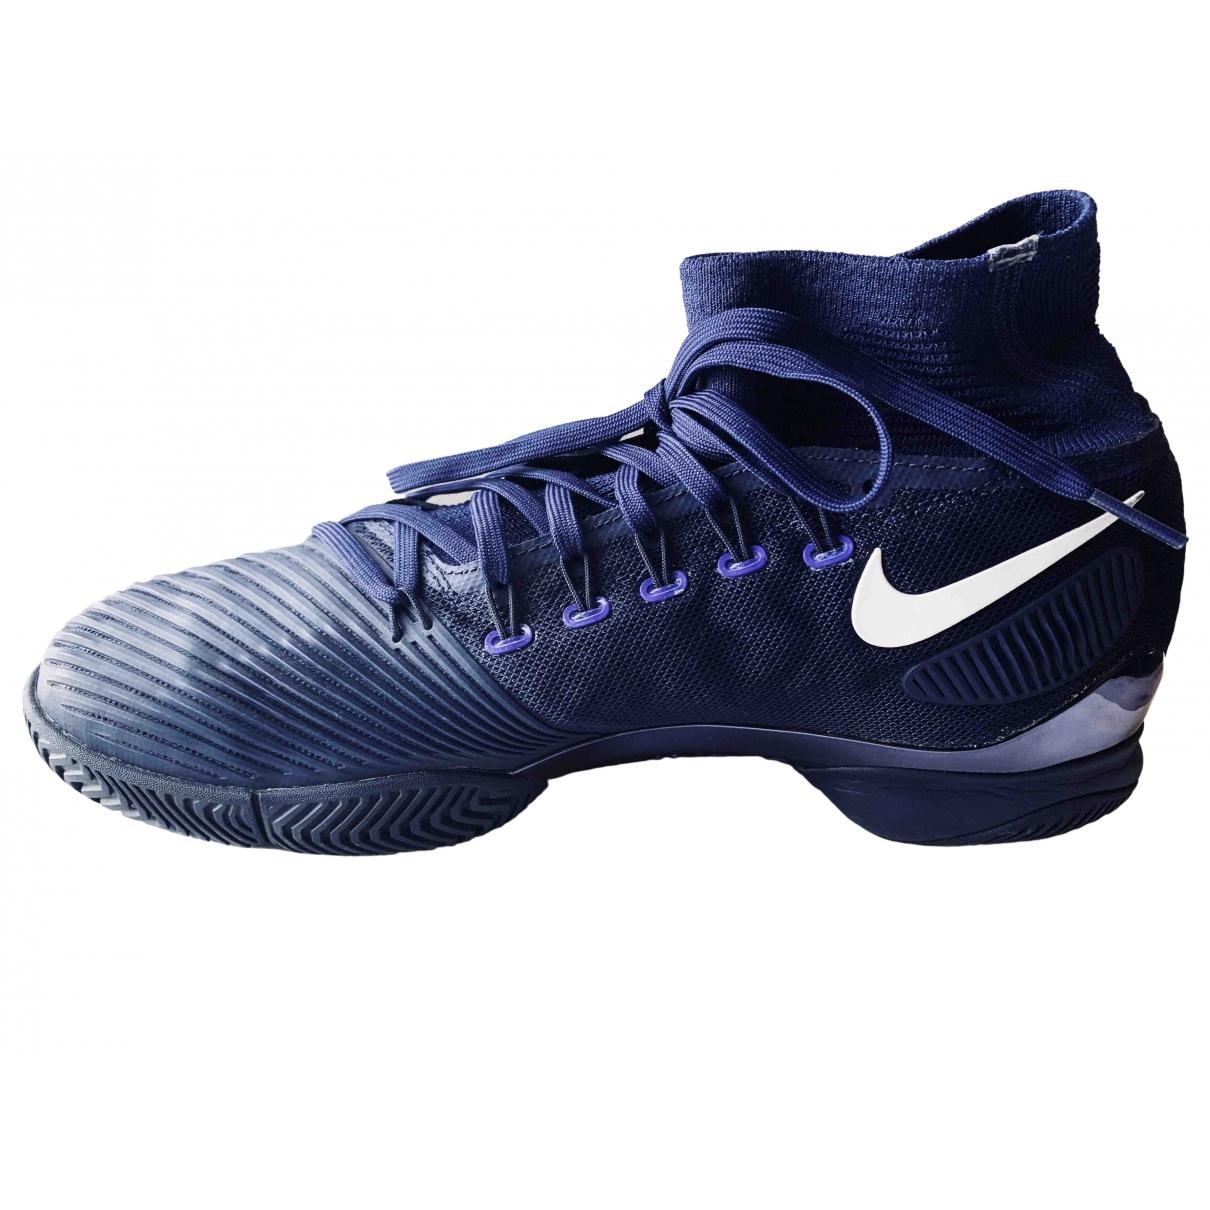 Nike - Baskets Zoom Fly  pour homme en toile - bleu